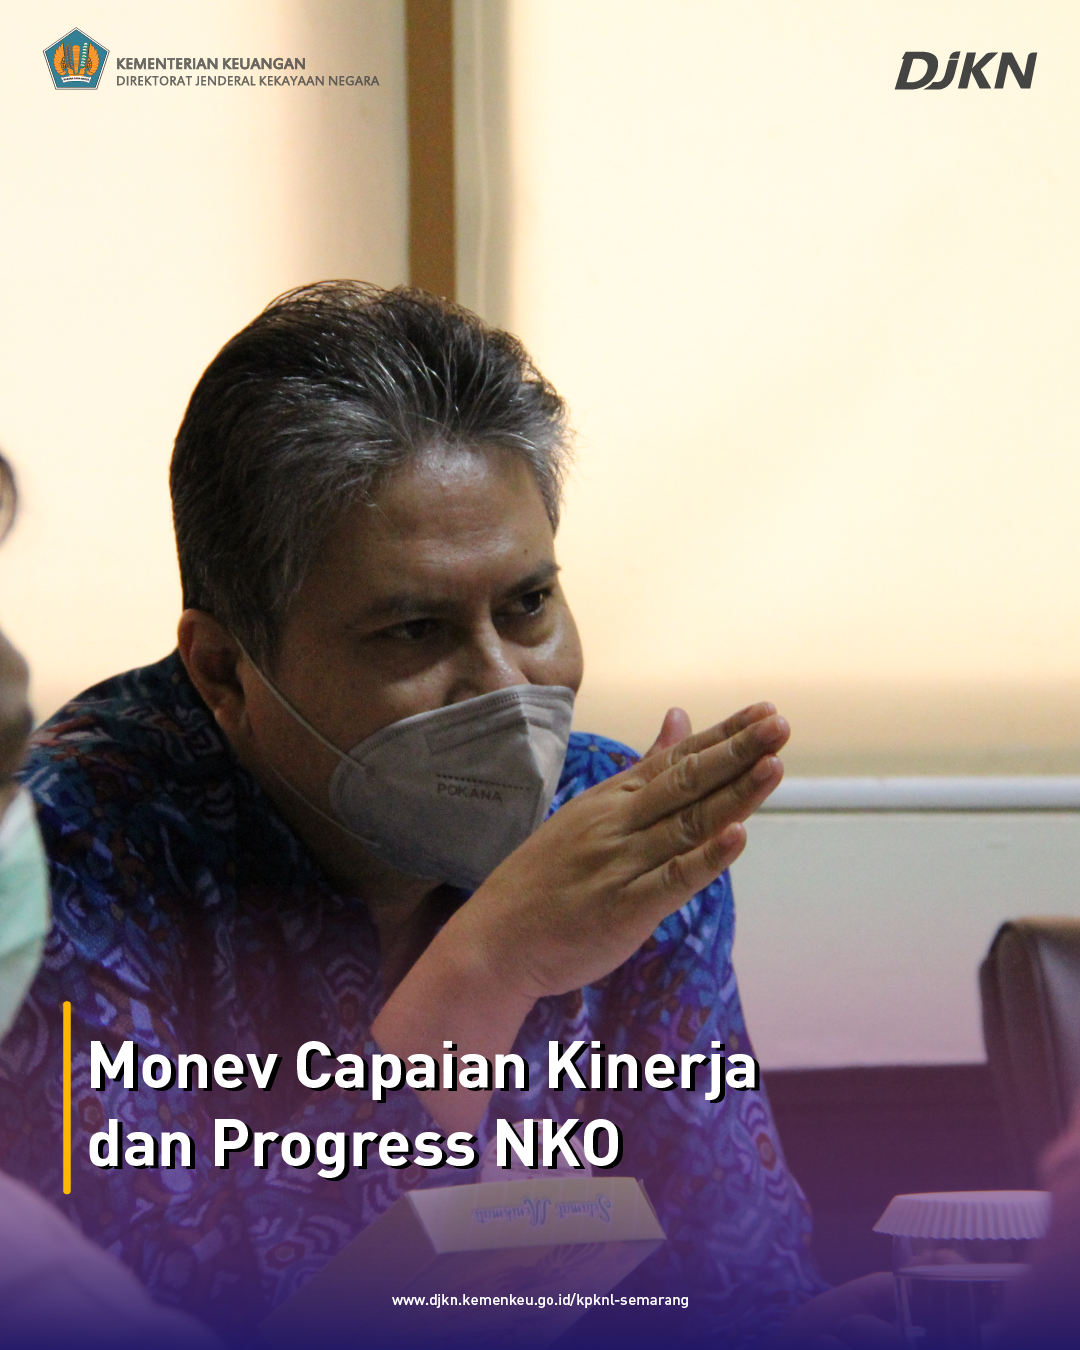 Monev Progress Kinerja, Kepala Kanwil DJKN Jateng DIY Lakukan Kunjungan ke KPKNL Semarang